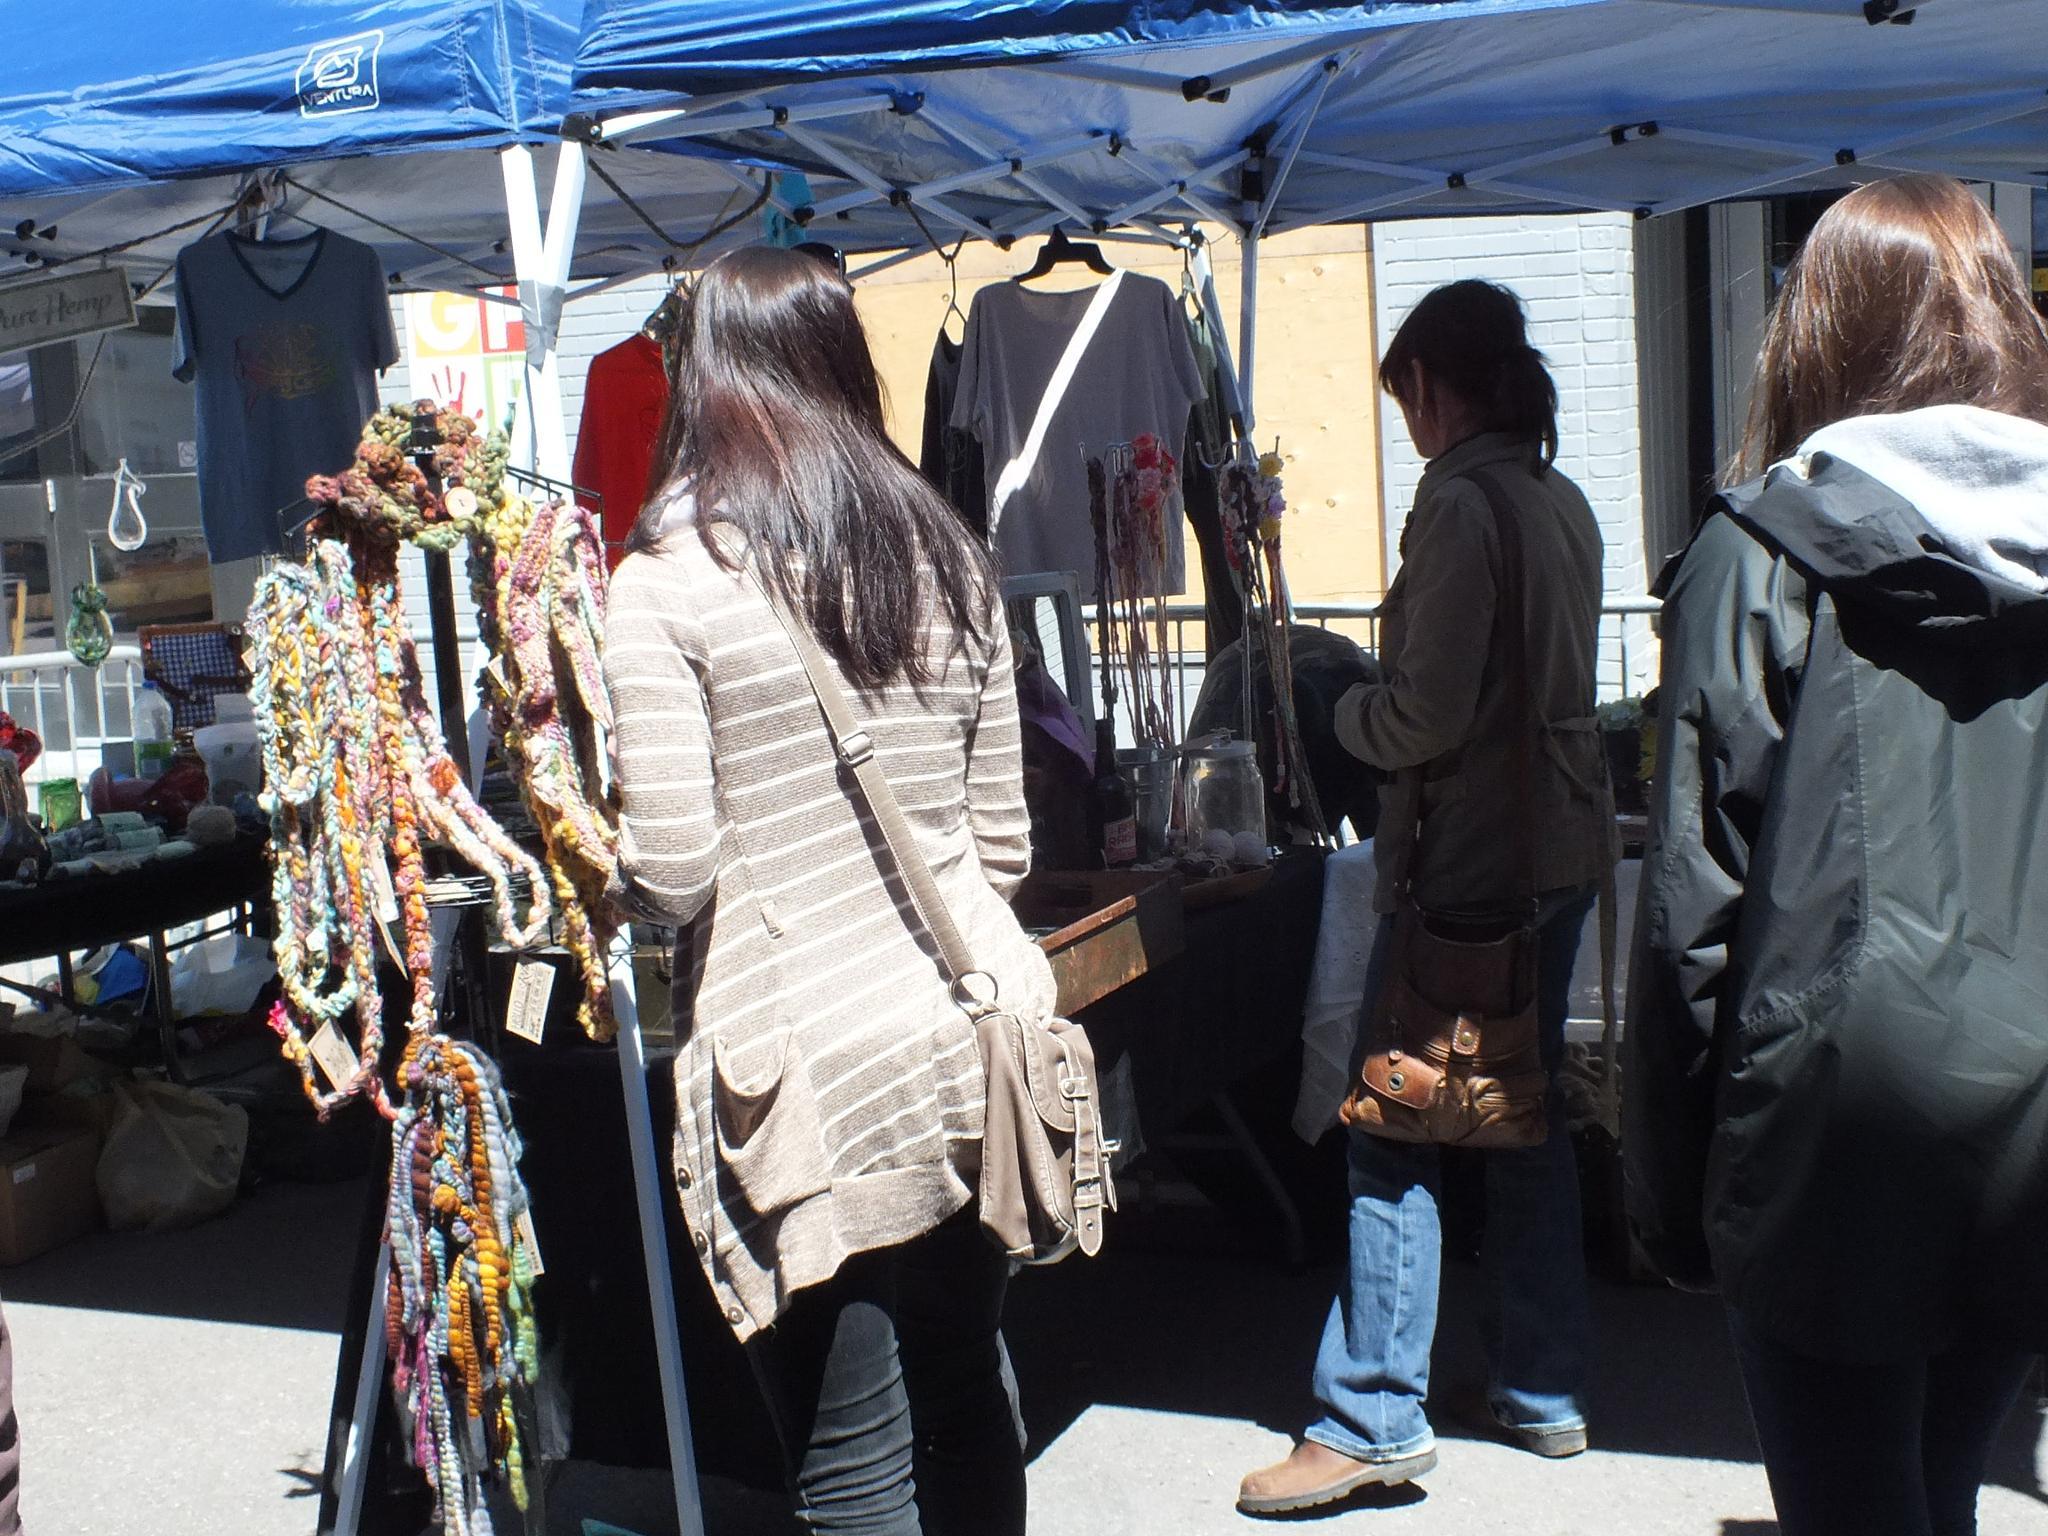 Craft sales by RegSoper